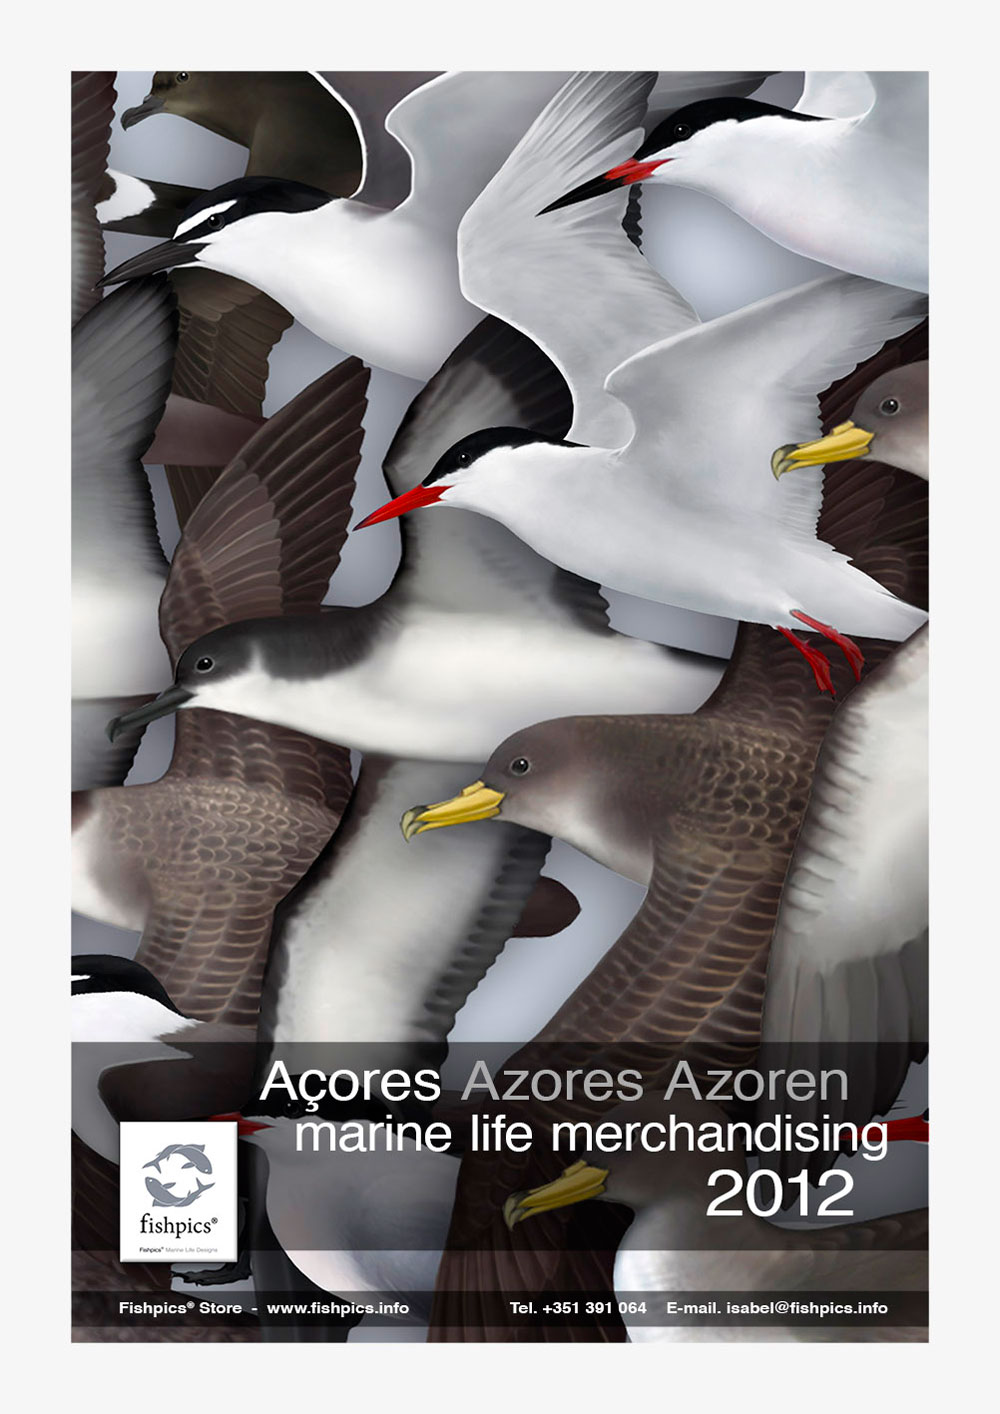 AZORES_FISHPICS_SLIDE_73w